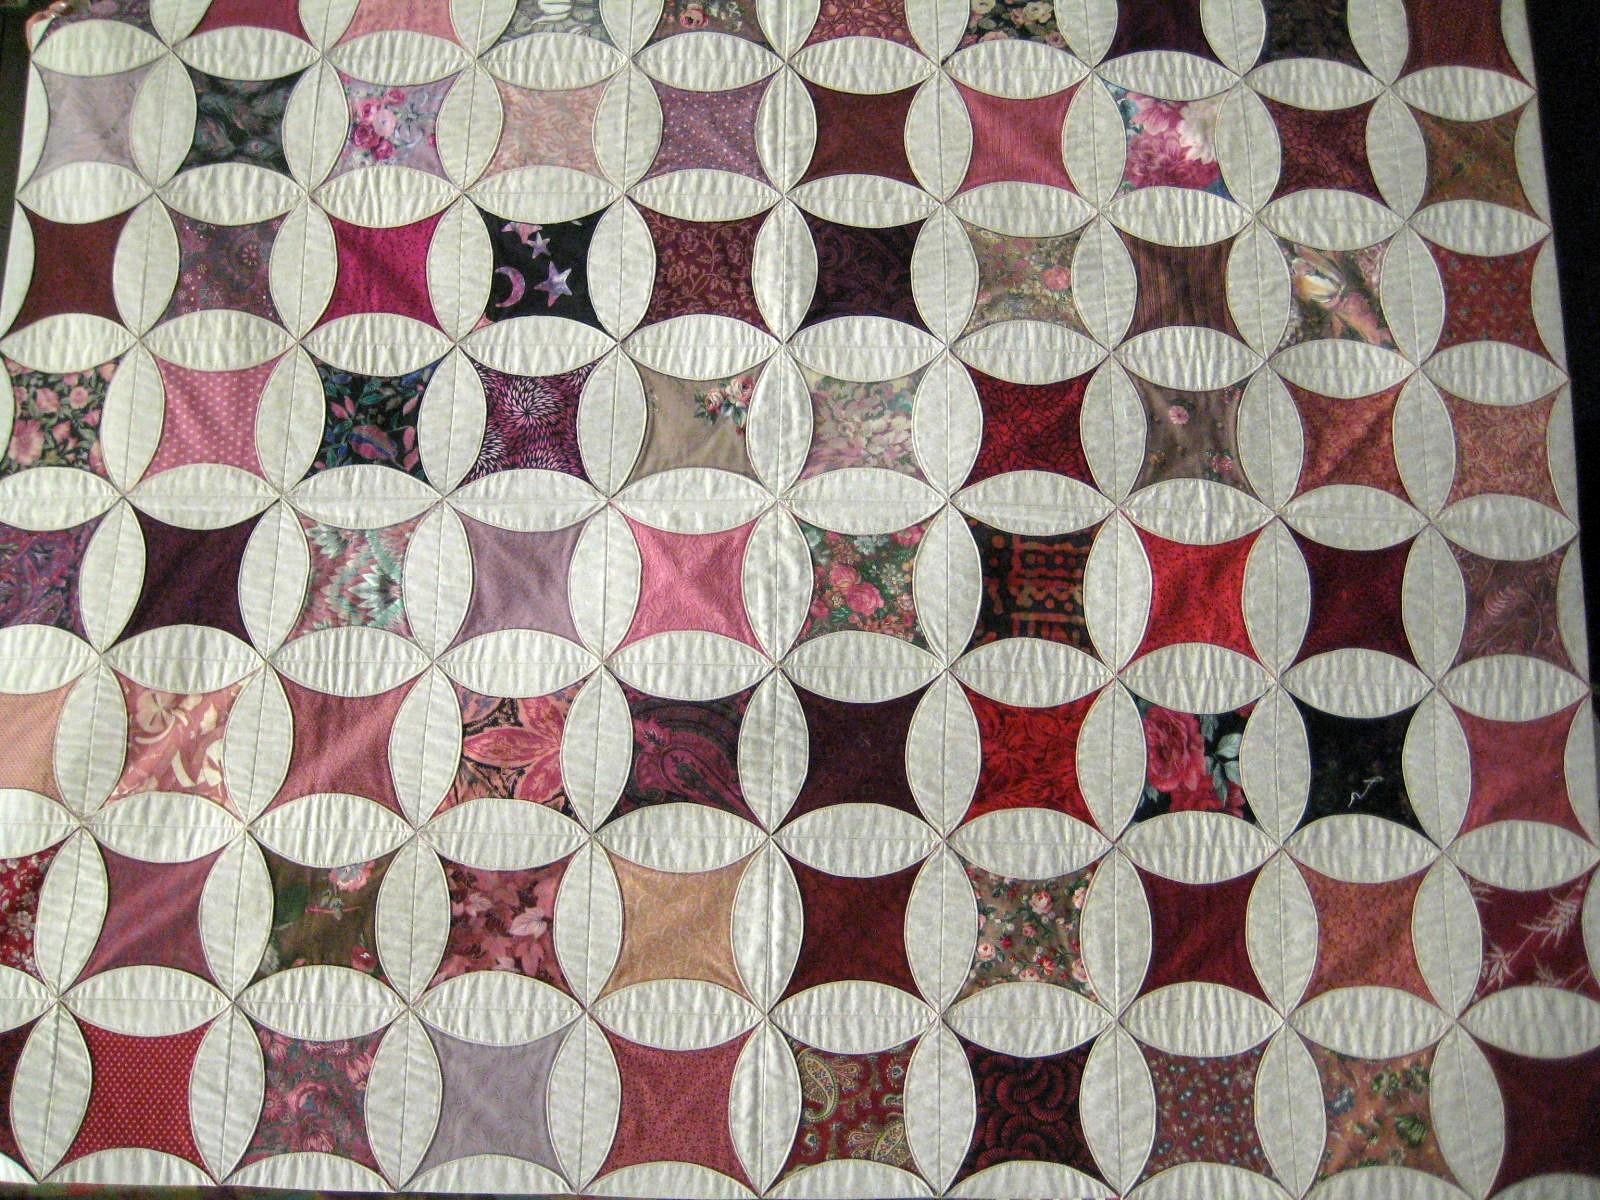 Quilting Guild Program Ideas : Carol Britt s Program: Circular Patchwork Star Quilters Guild